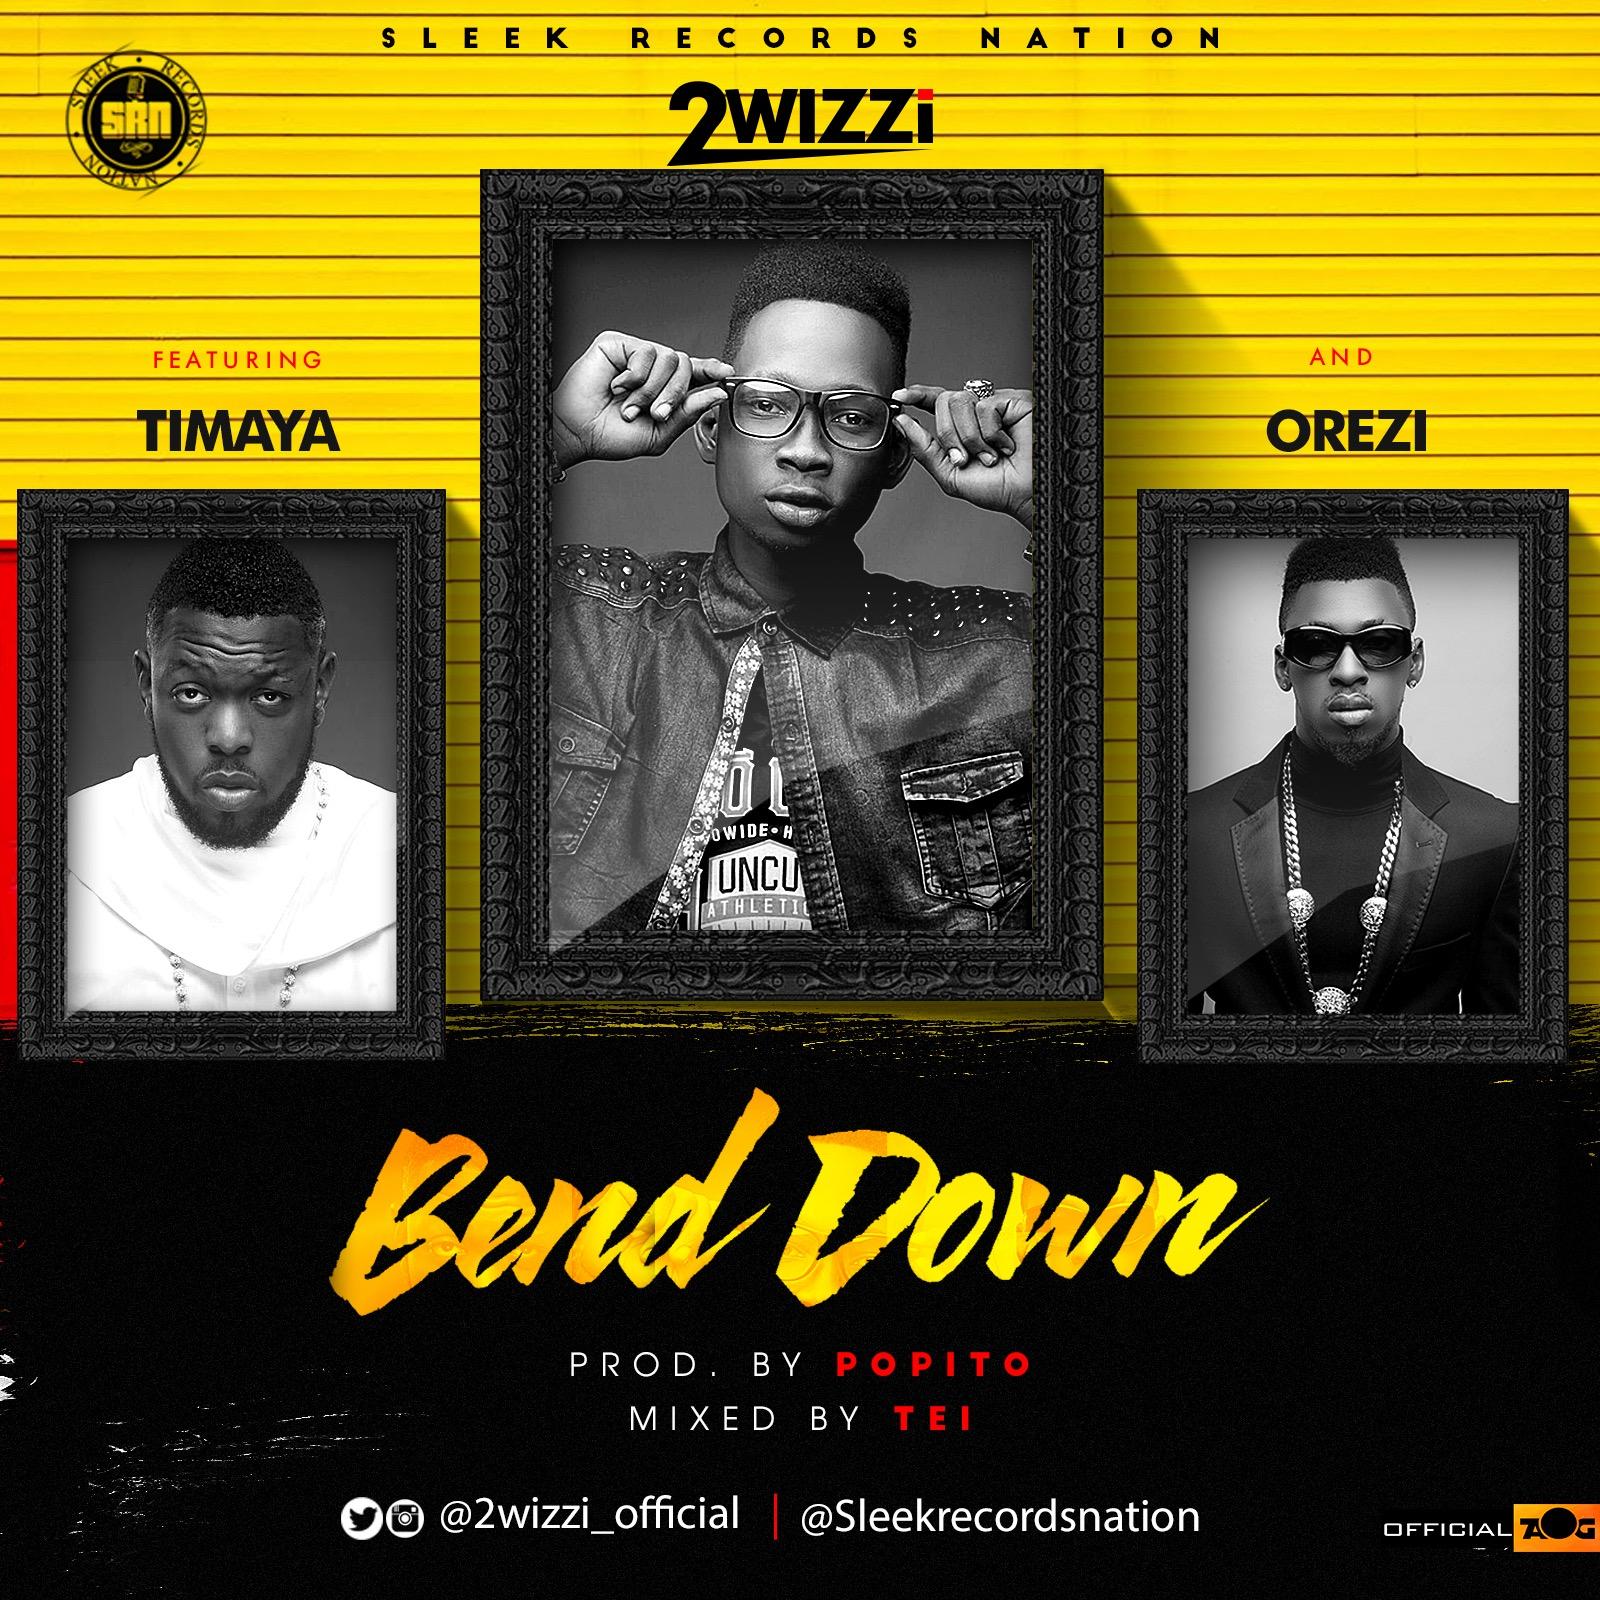 2Wizzi ft. Timaya x Orezi – Bend Down (prod. Popito)